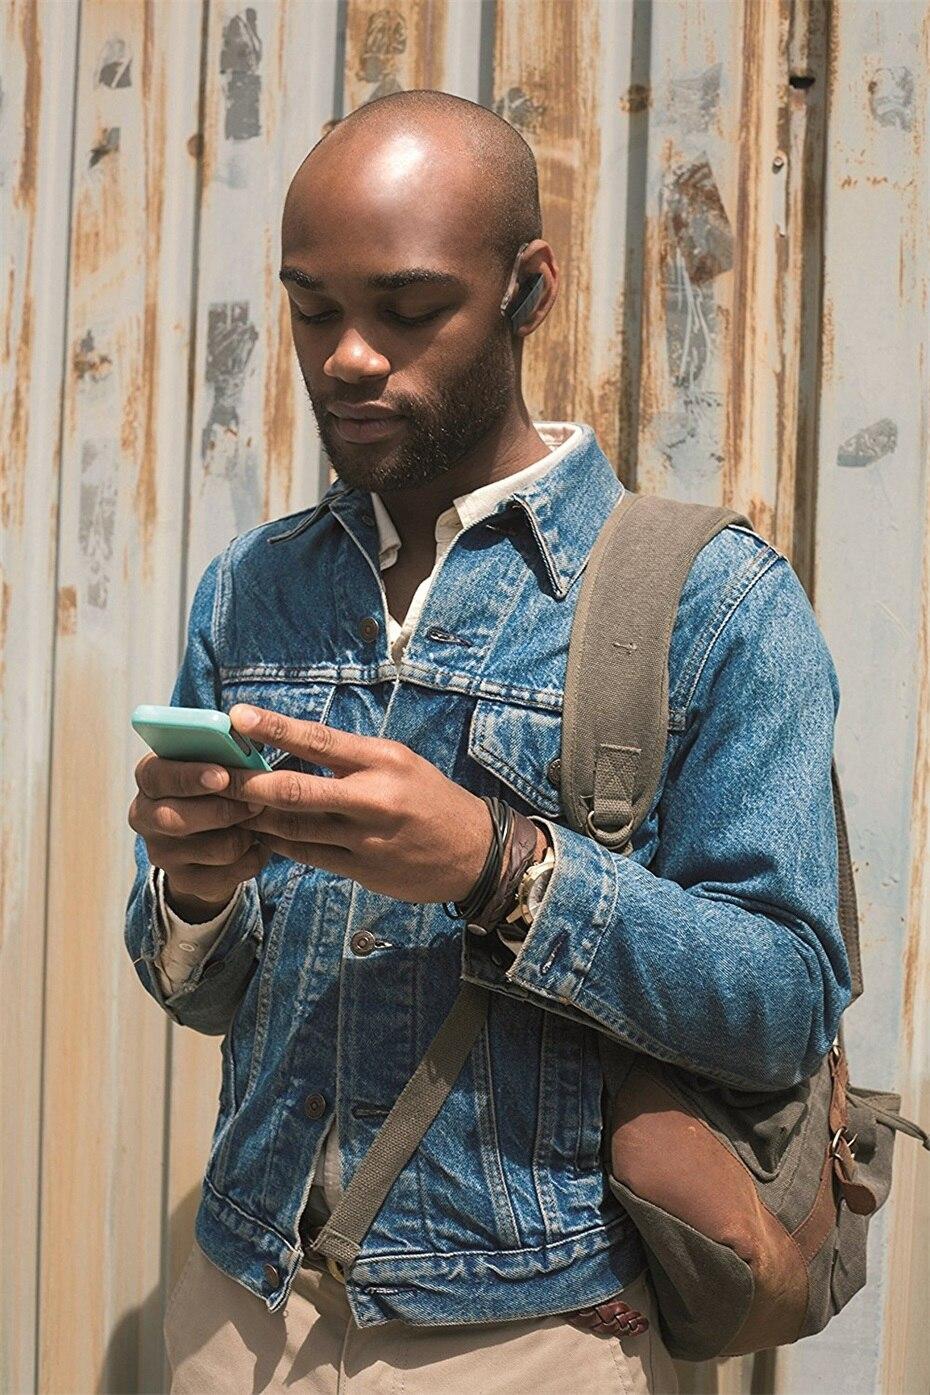 Plantronics EXPLORER 50 Mobile Bluetooth Wireless Earphone Headset HD Voice Control Stream Audio For Smartphone Hands-free Call (4)